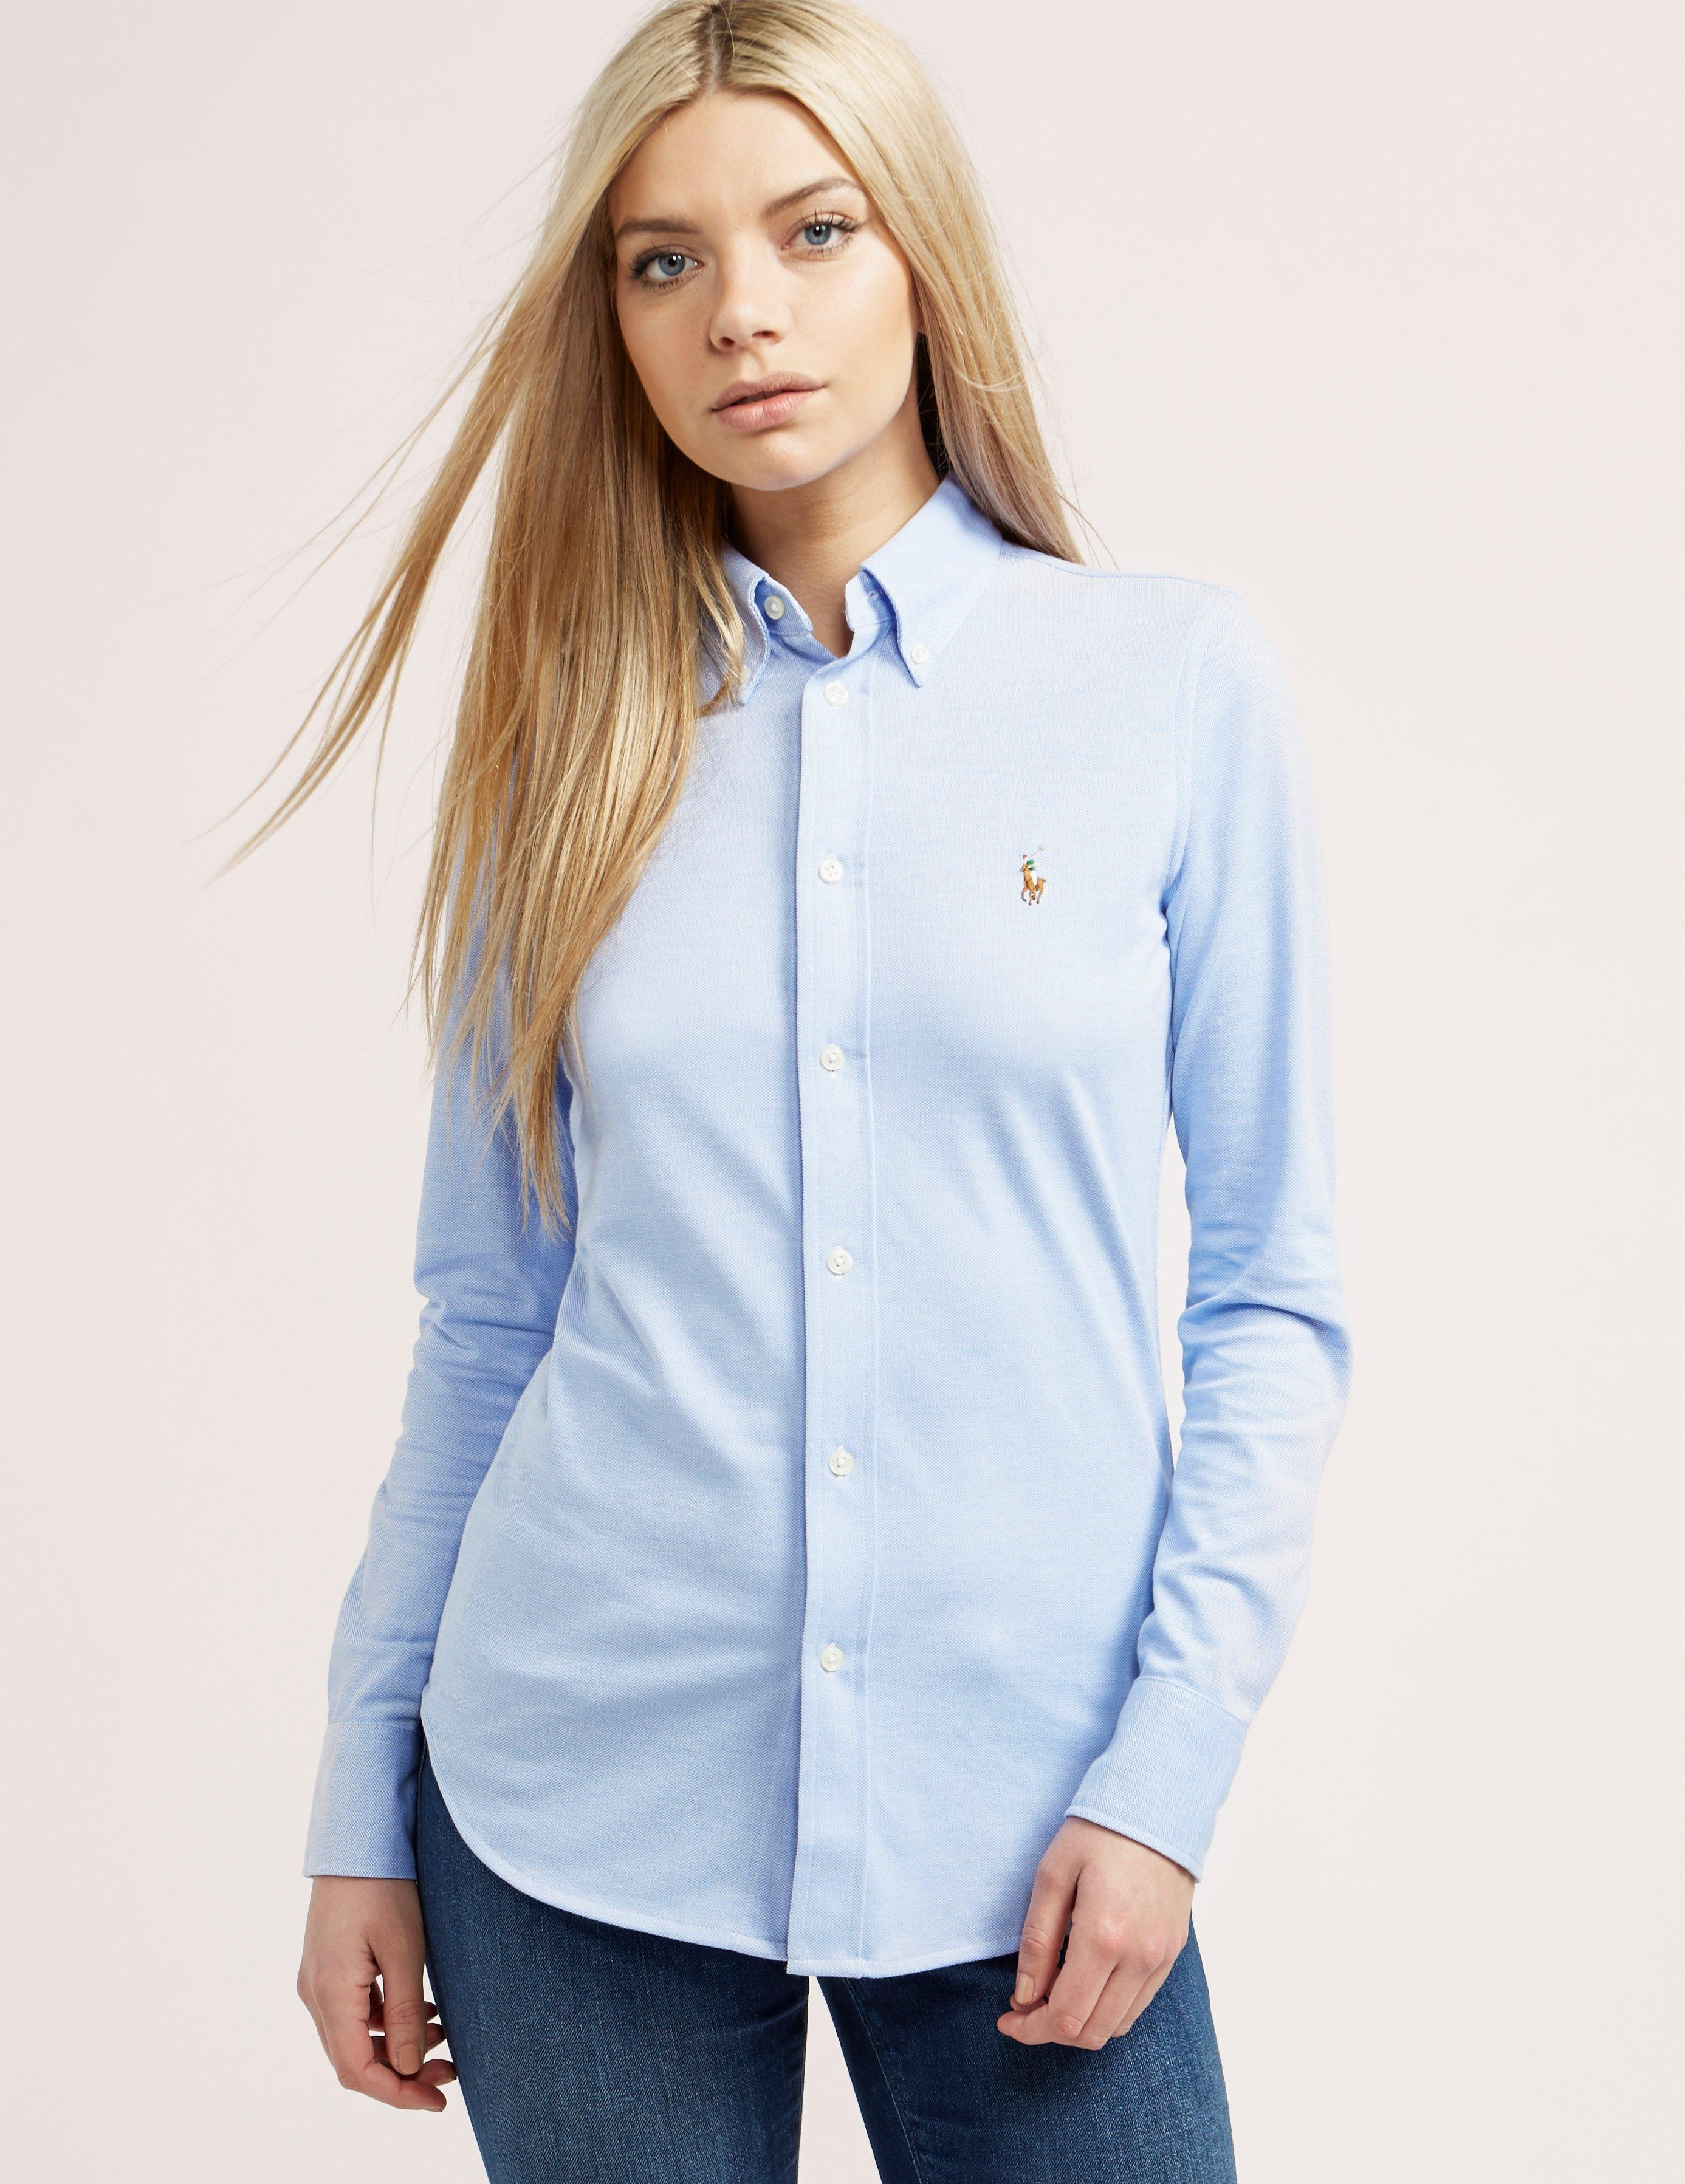 Lyst - Polo Ralph Lauren Womens Oxford Shirt Blue in Blue